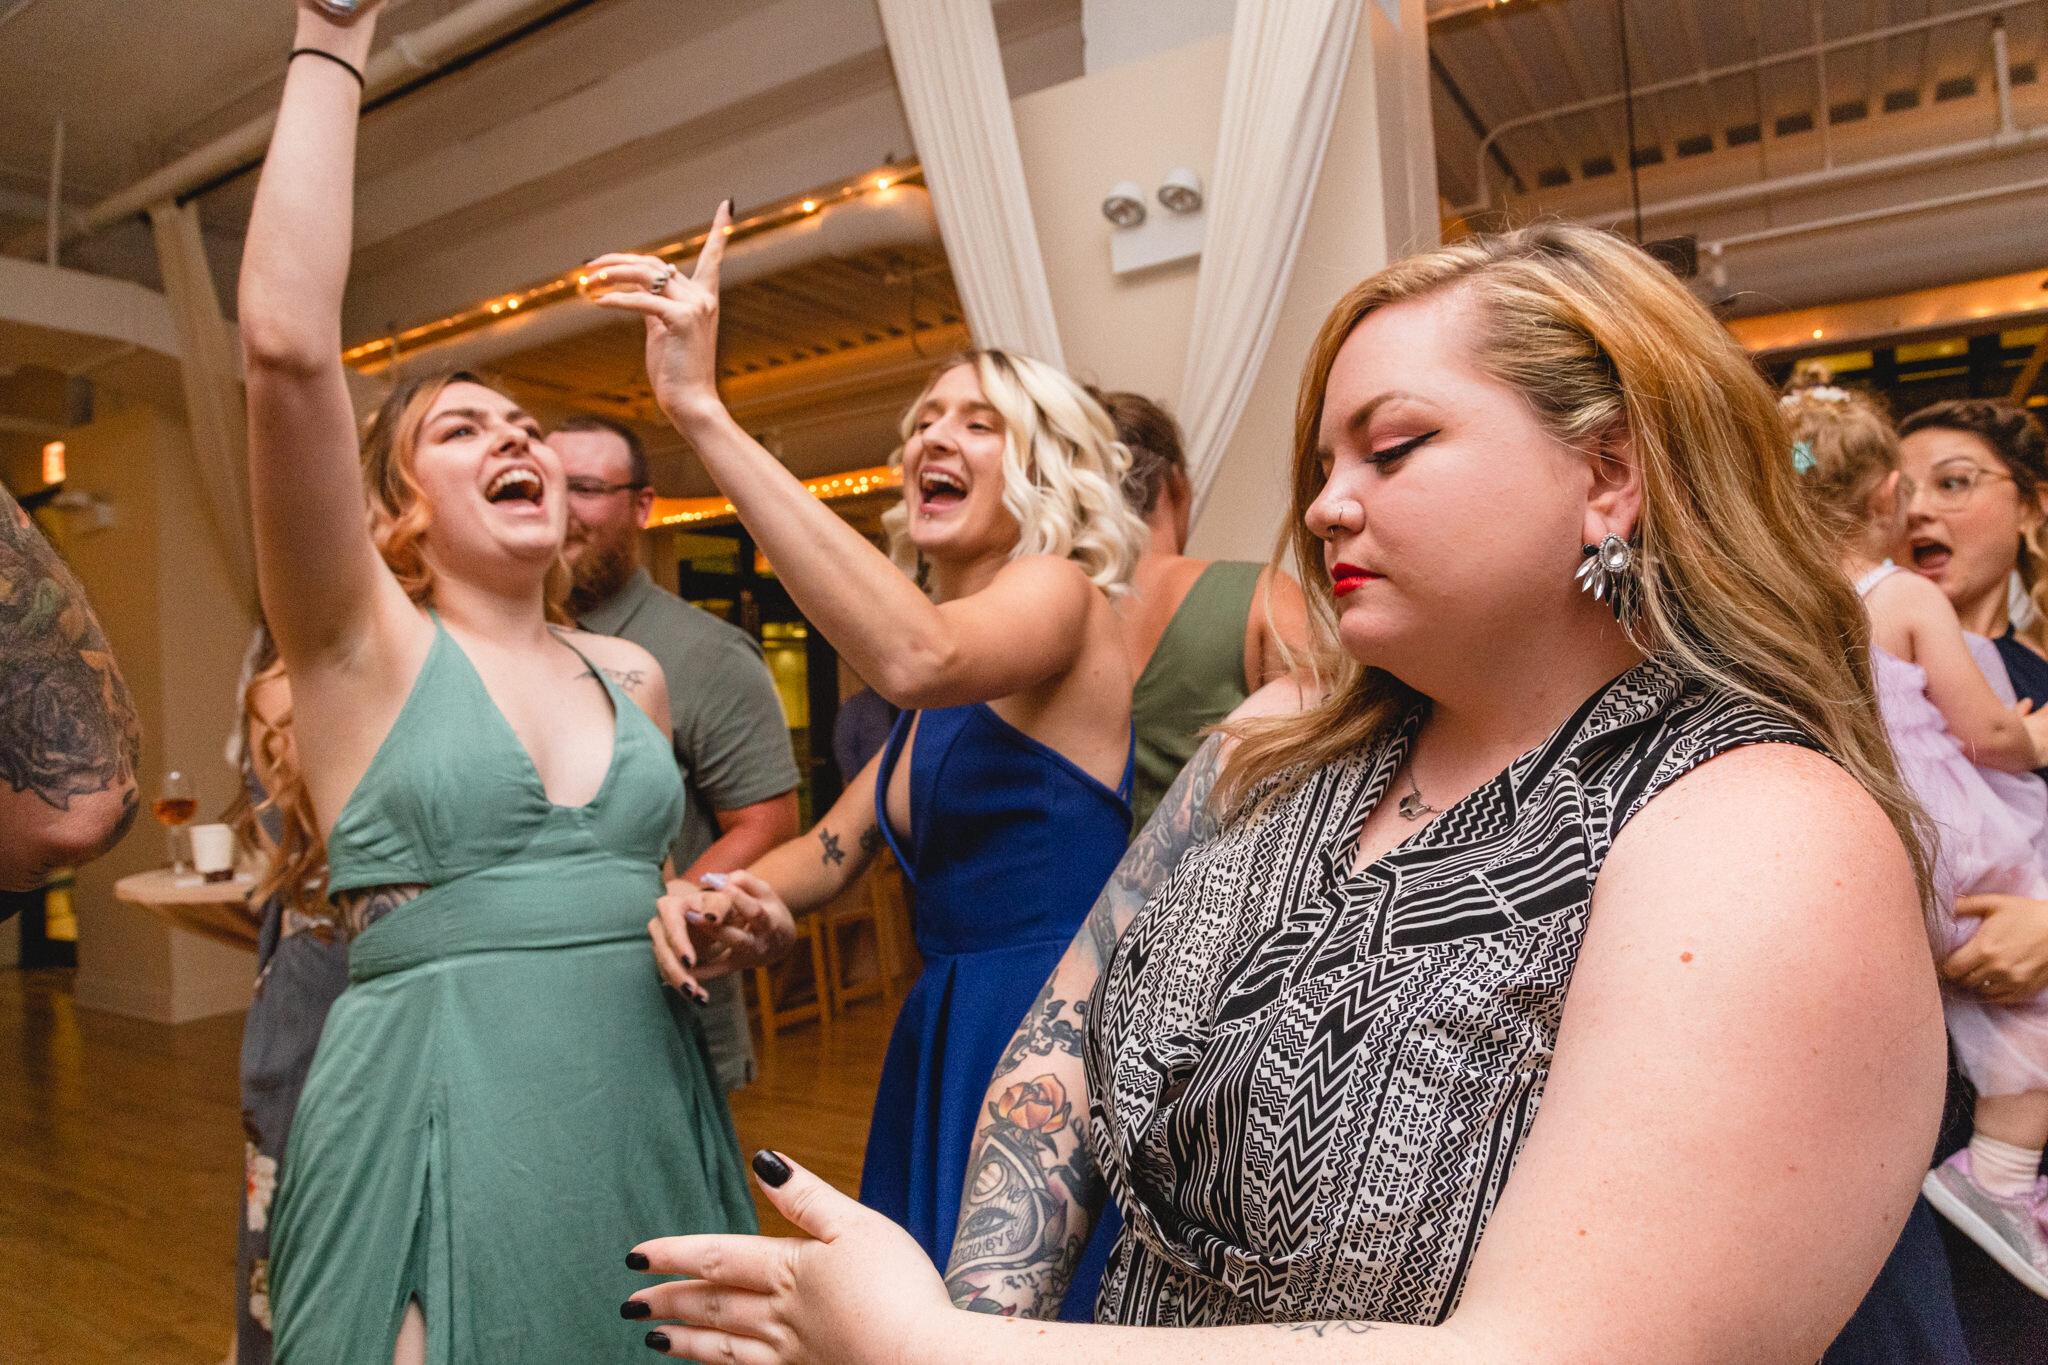 chicago-greenhouse-loft-wedding-dance-rebeccaylasotras-7.jpg